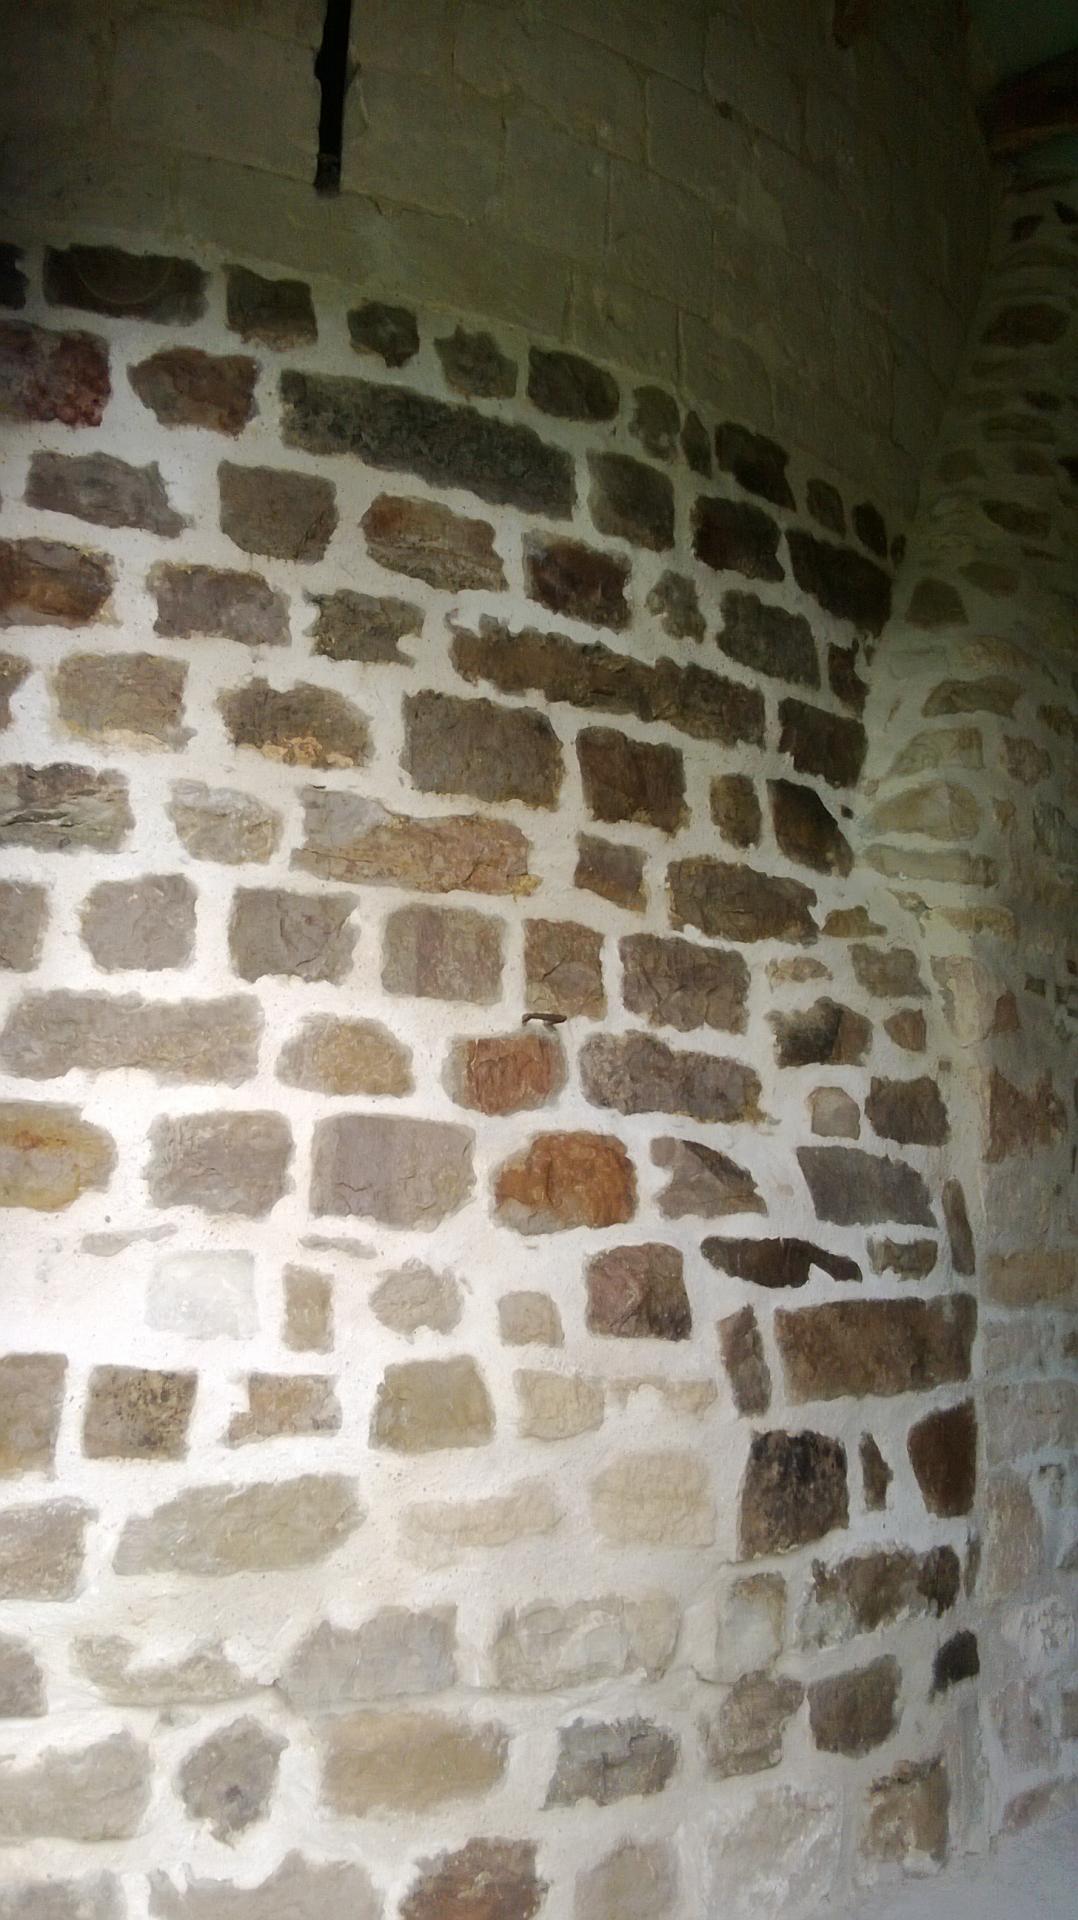 Mur en pierres intérieur